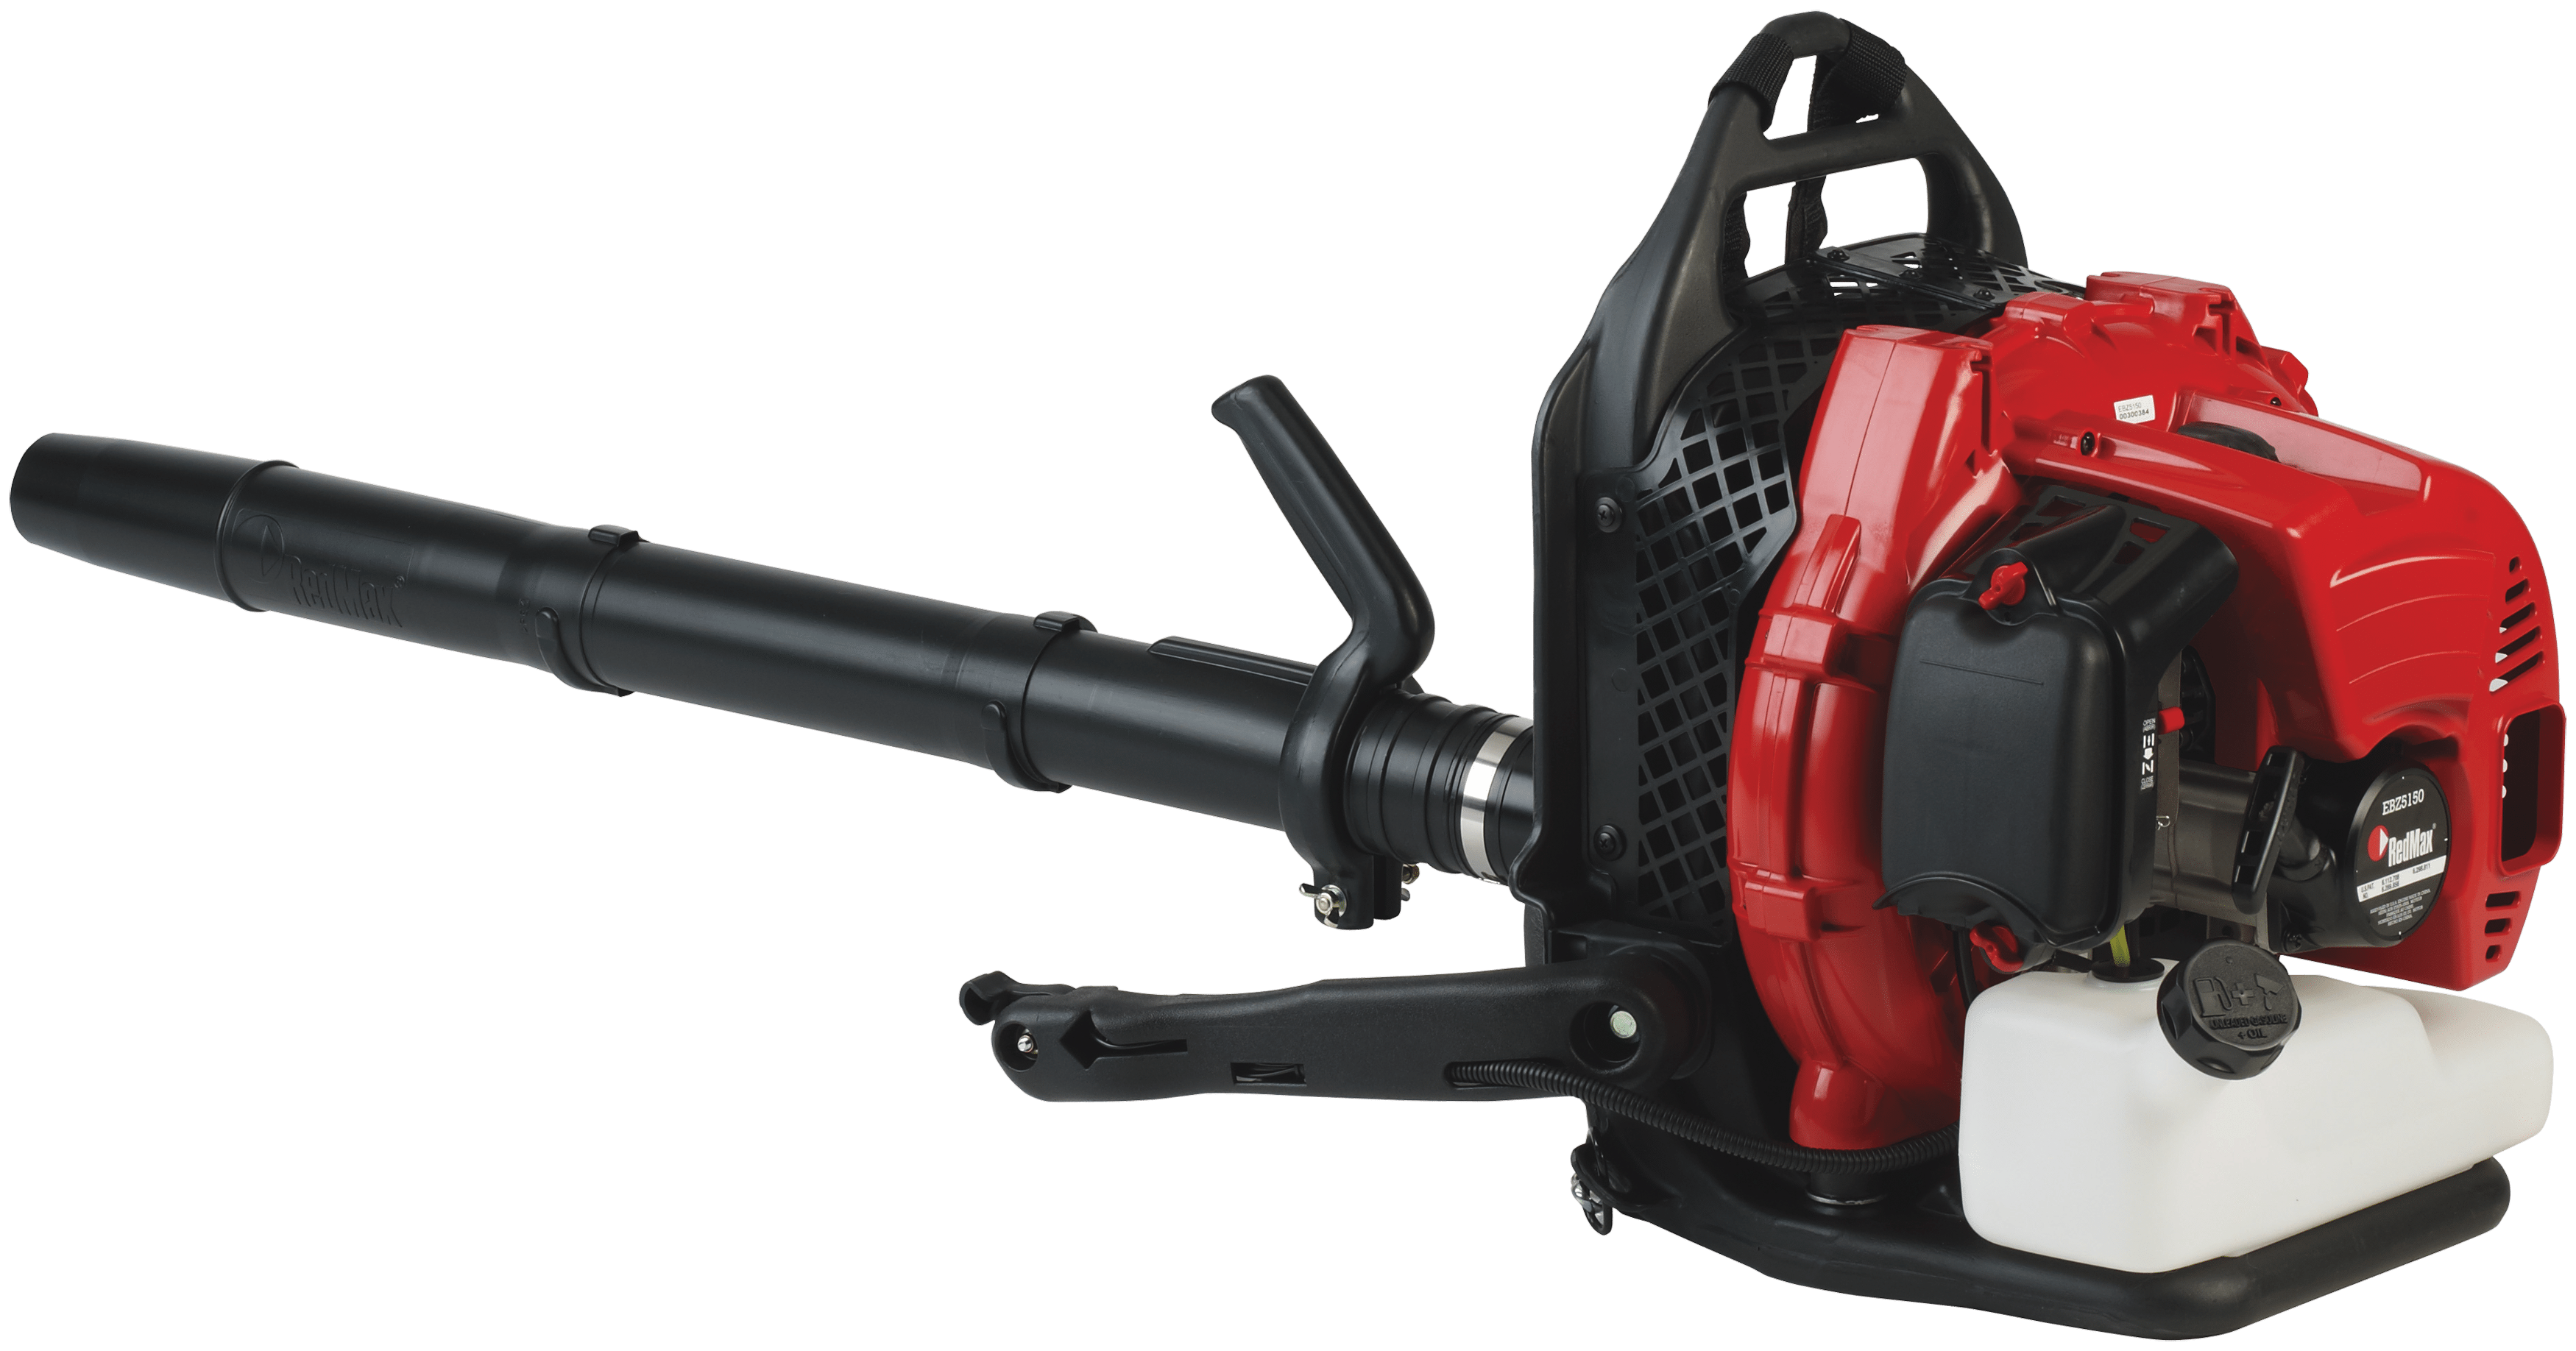 RedMax EBZ5100 EB7001 Backpack Blower Tube Kit 4 Piece